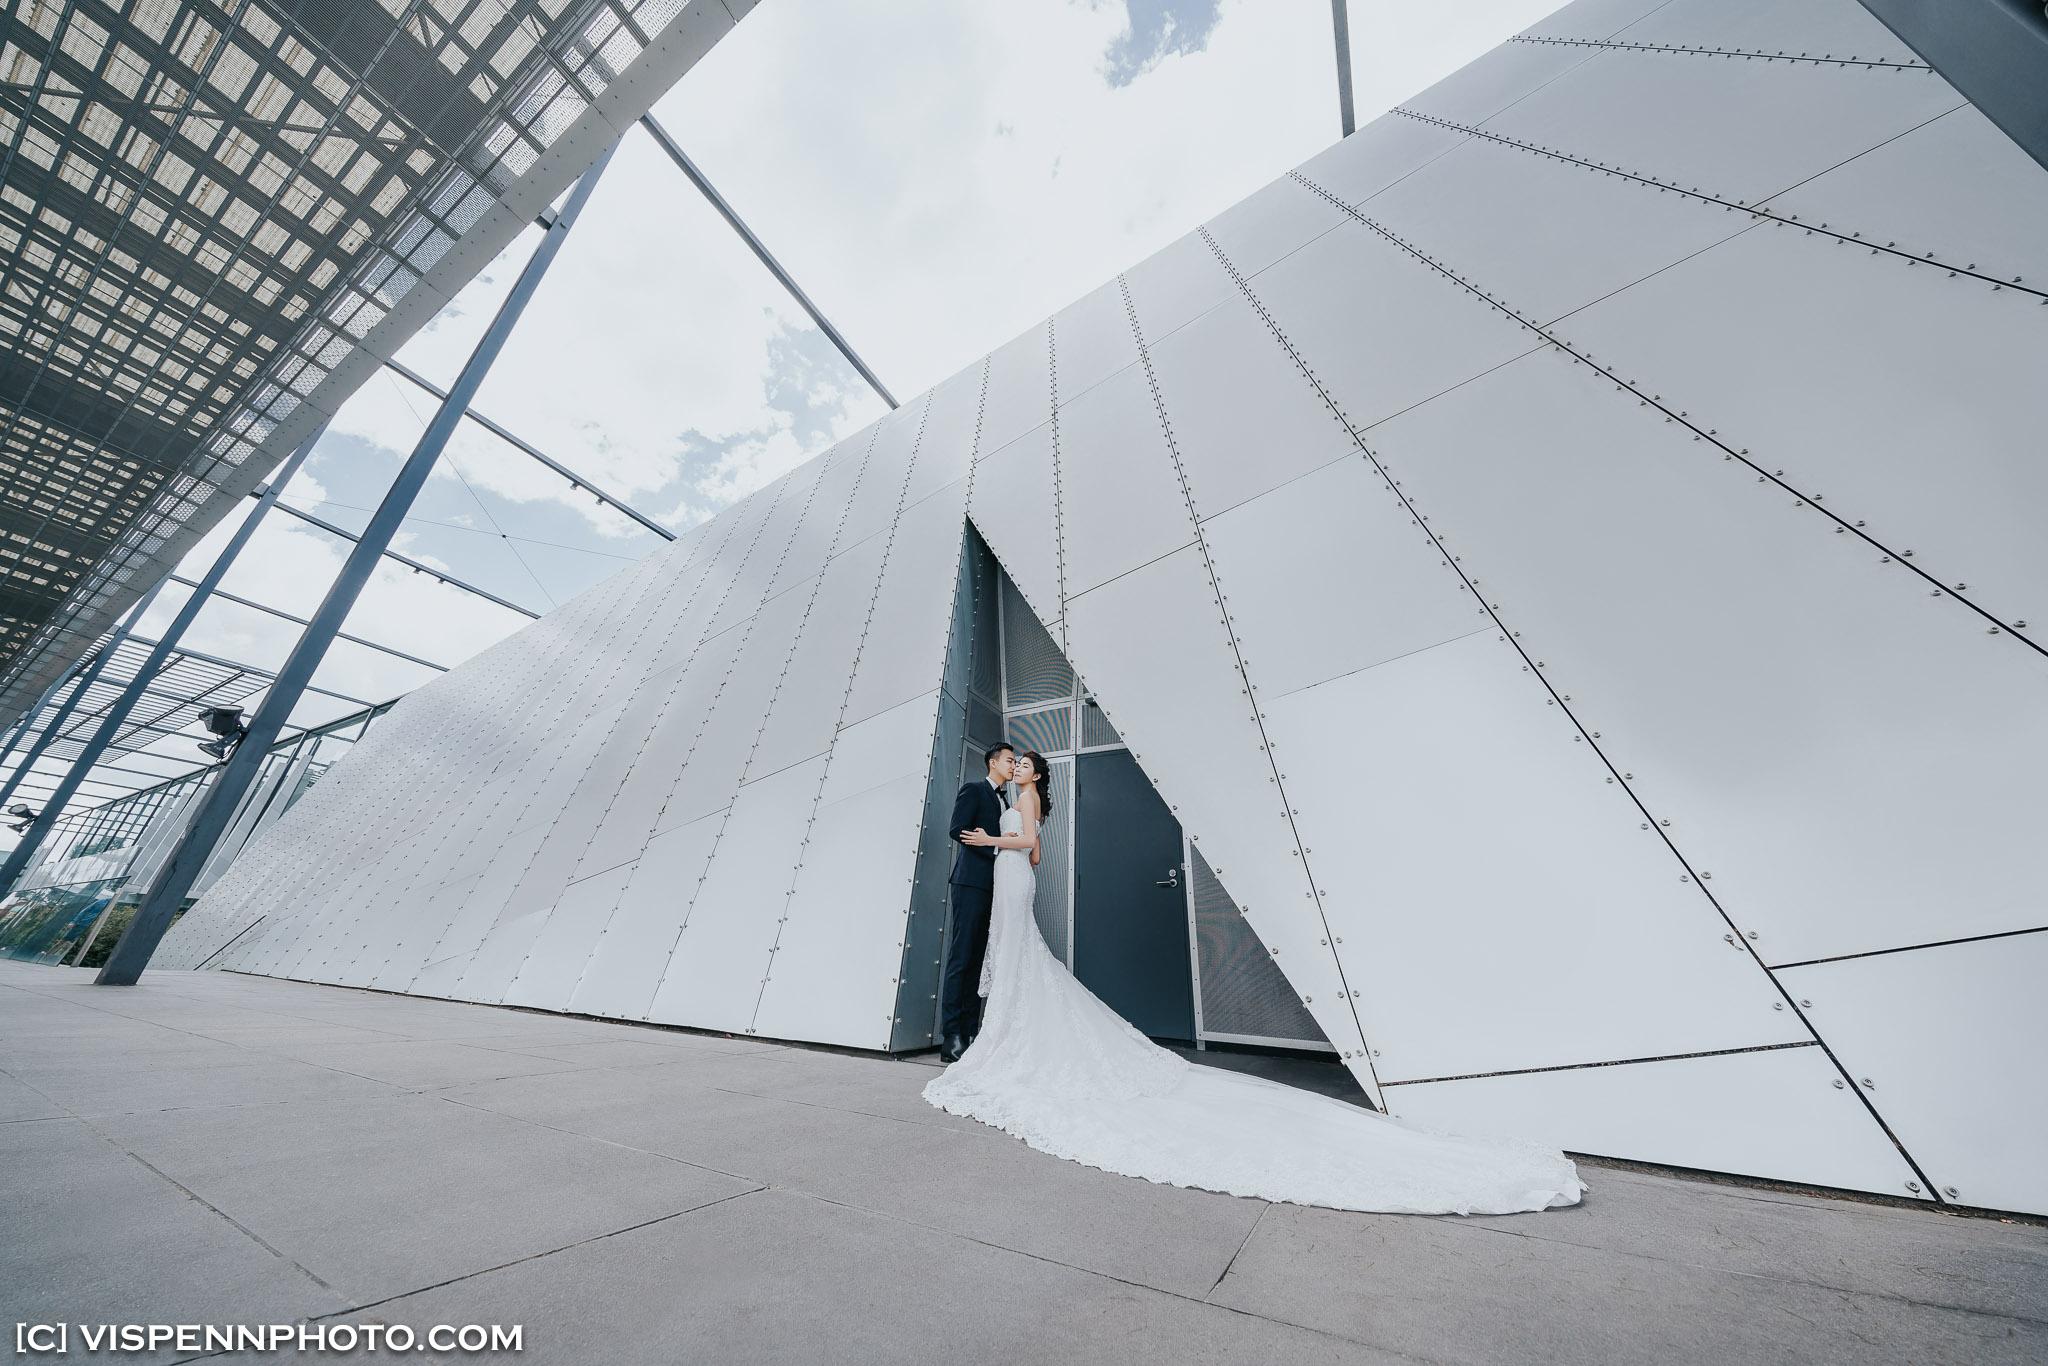 PRE WEDDING Photography Melbourne VISPENN 墨尔本 婚纱照 结婚照 婚纱摄影 VISPENN Kwok P2 0406